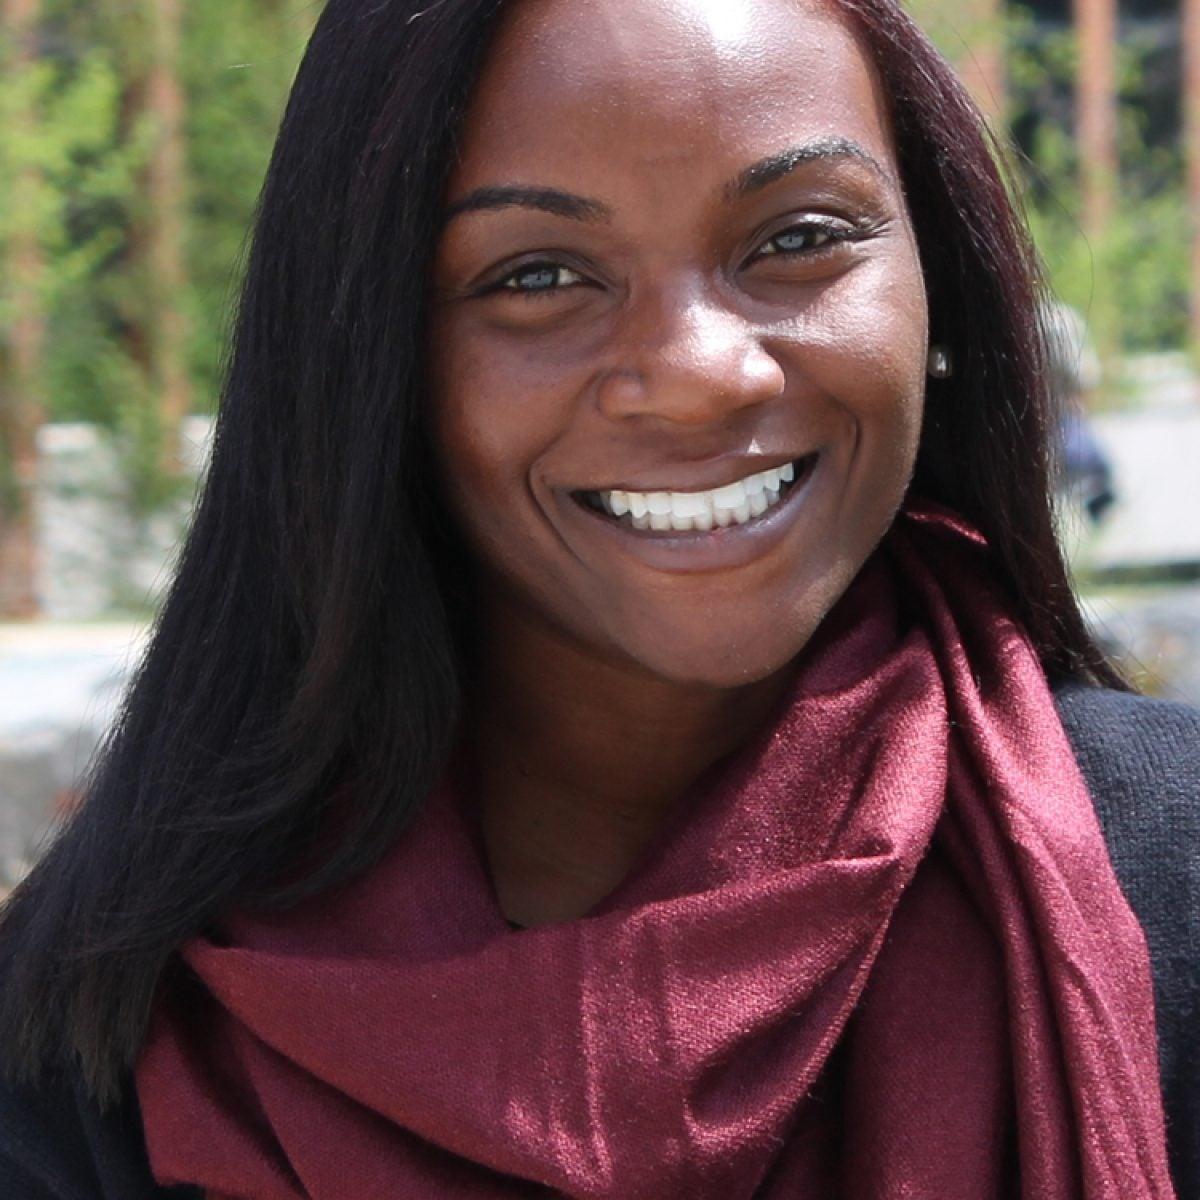 Moderna Vaccine Co-Lead Dr. Kizzmekia Corbett Shares Her Journey